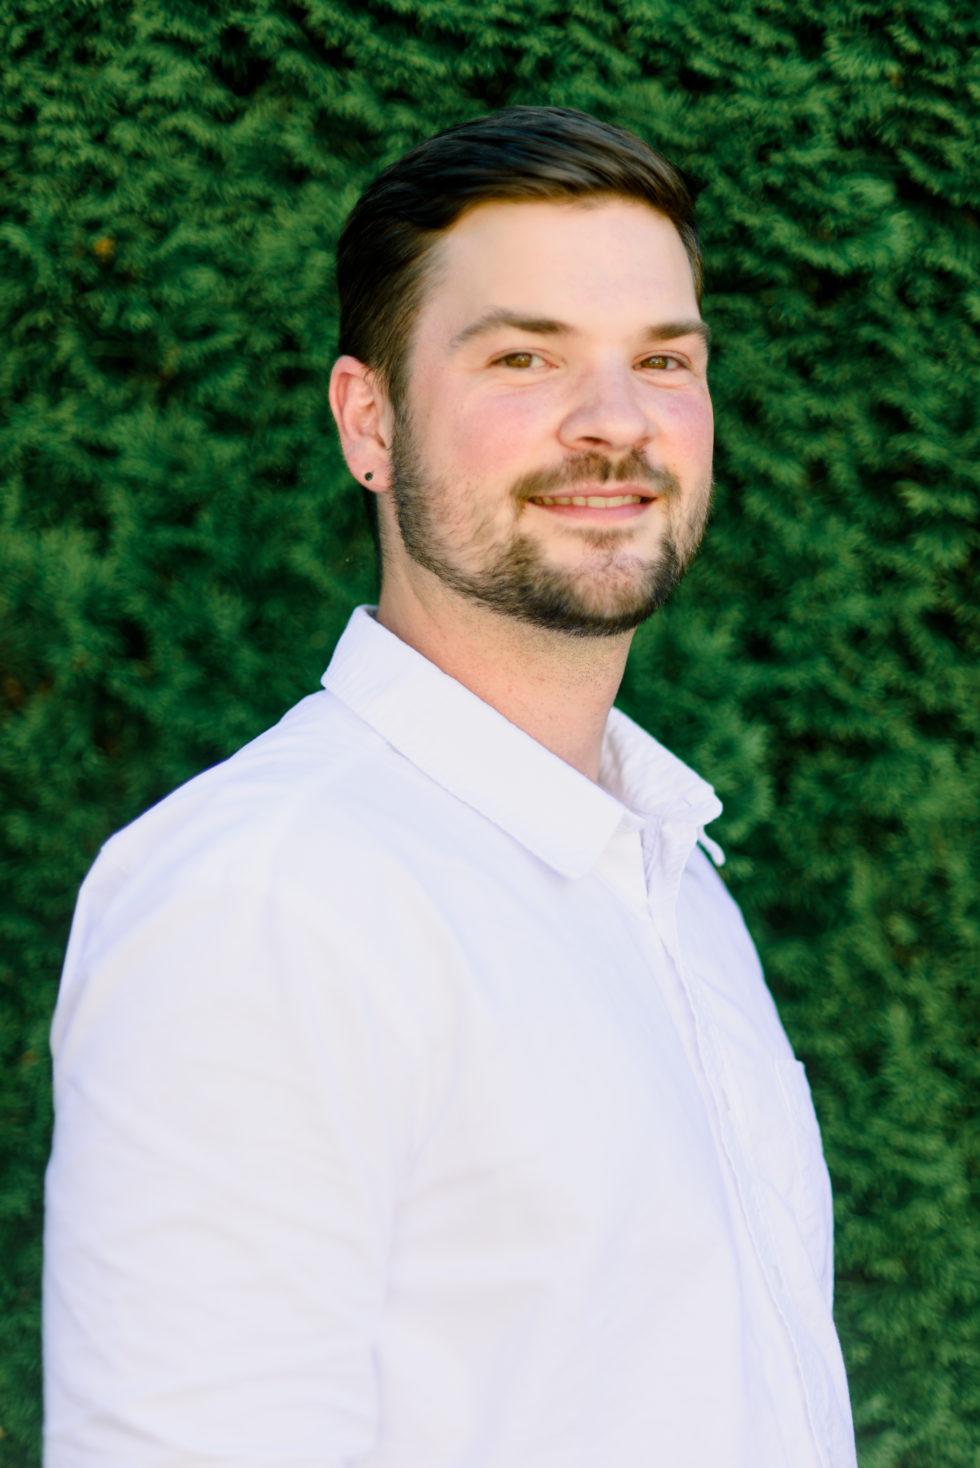 Employee Spotlight: Kyle Squire